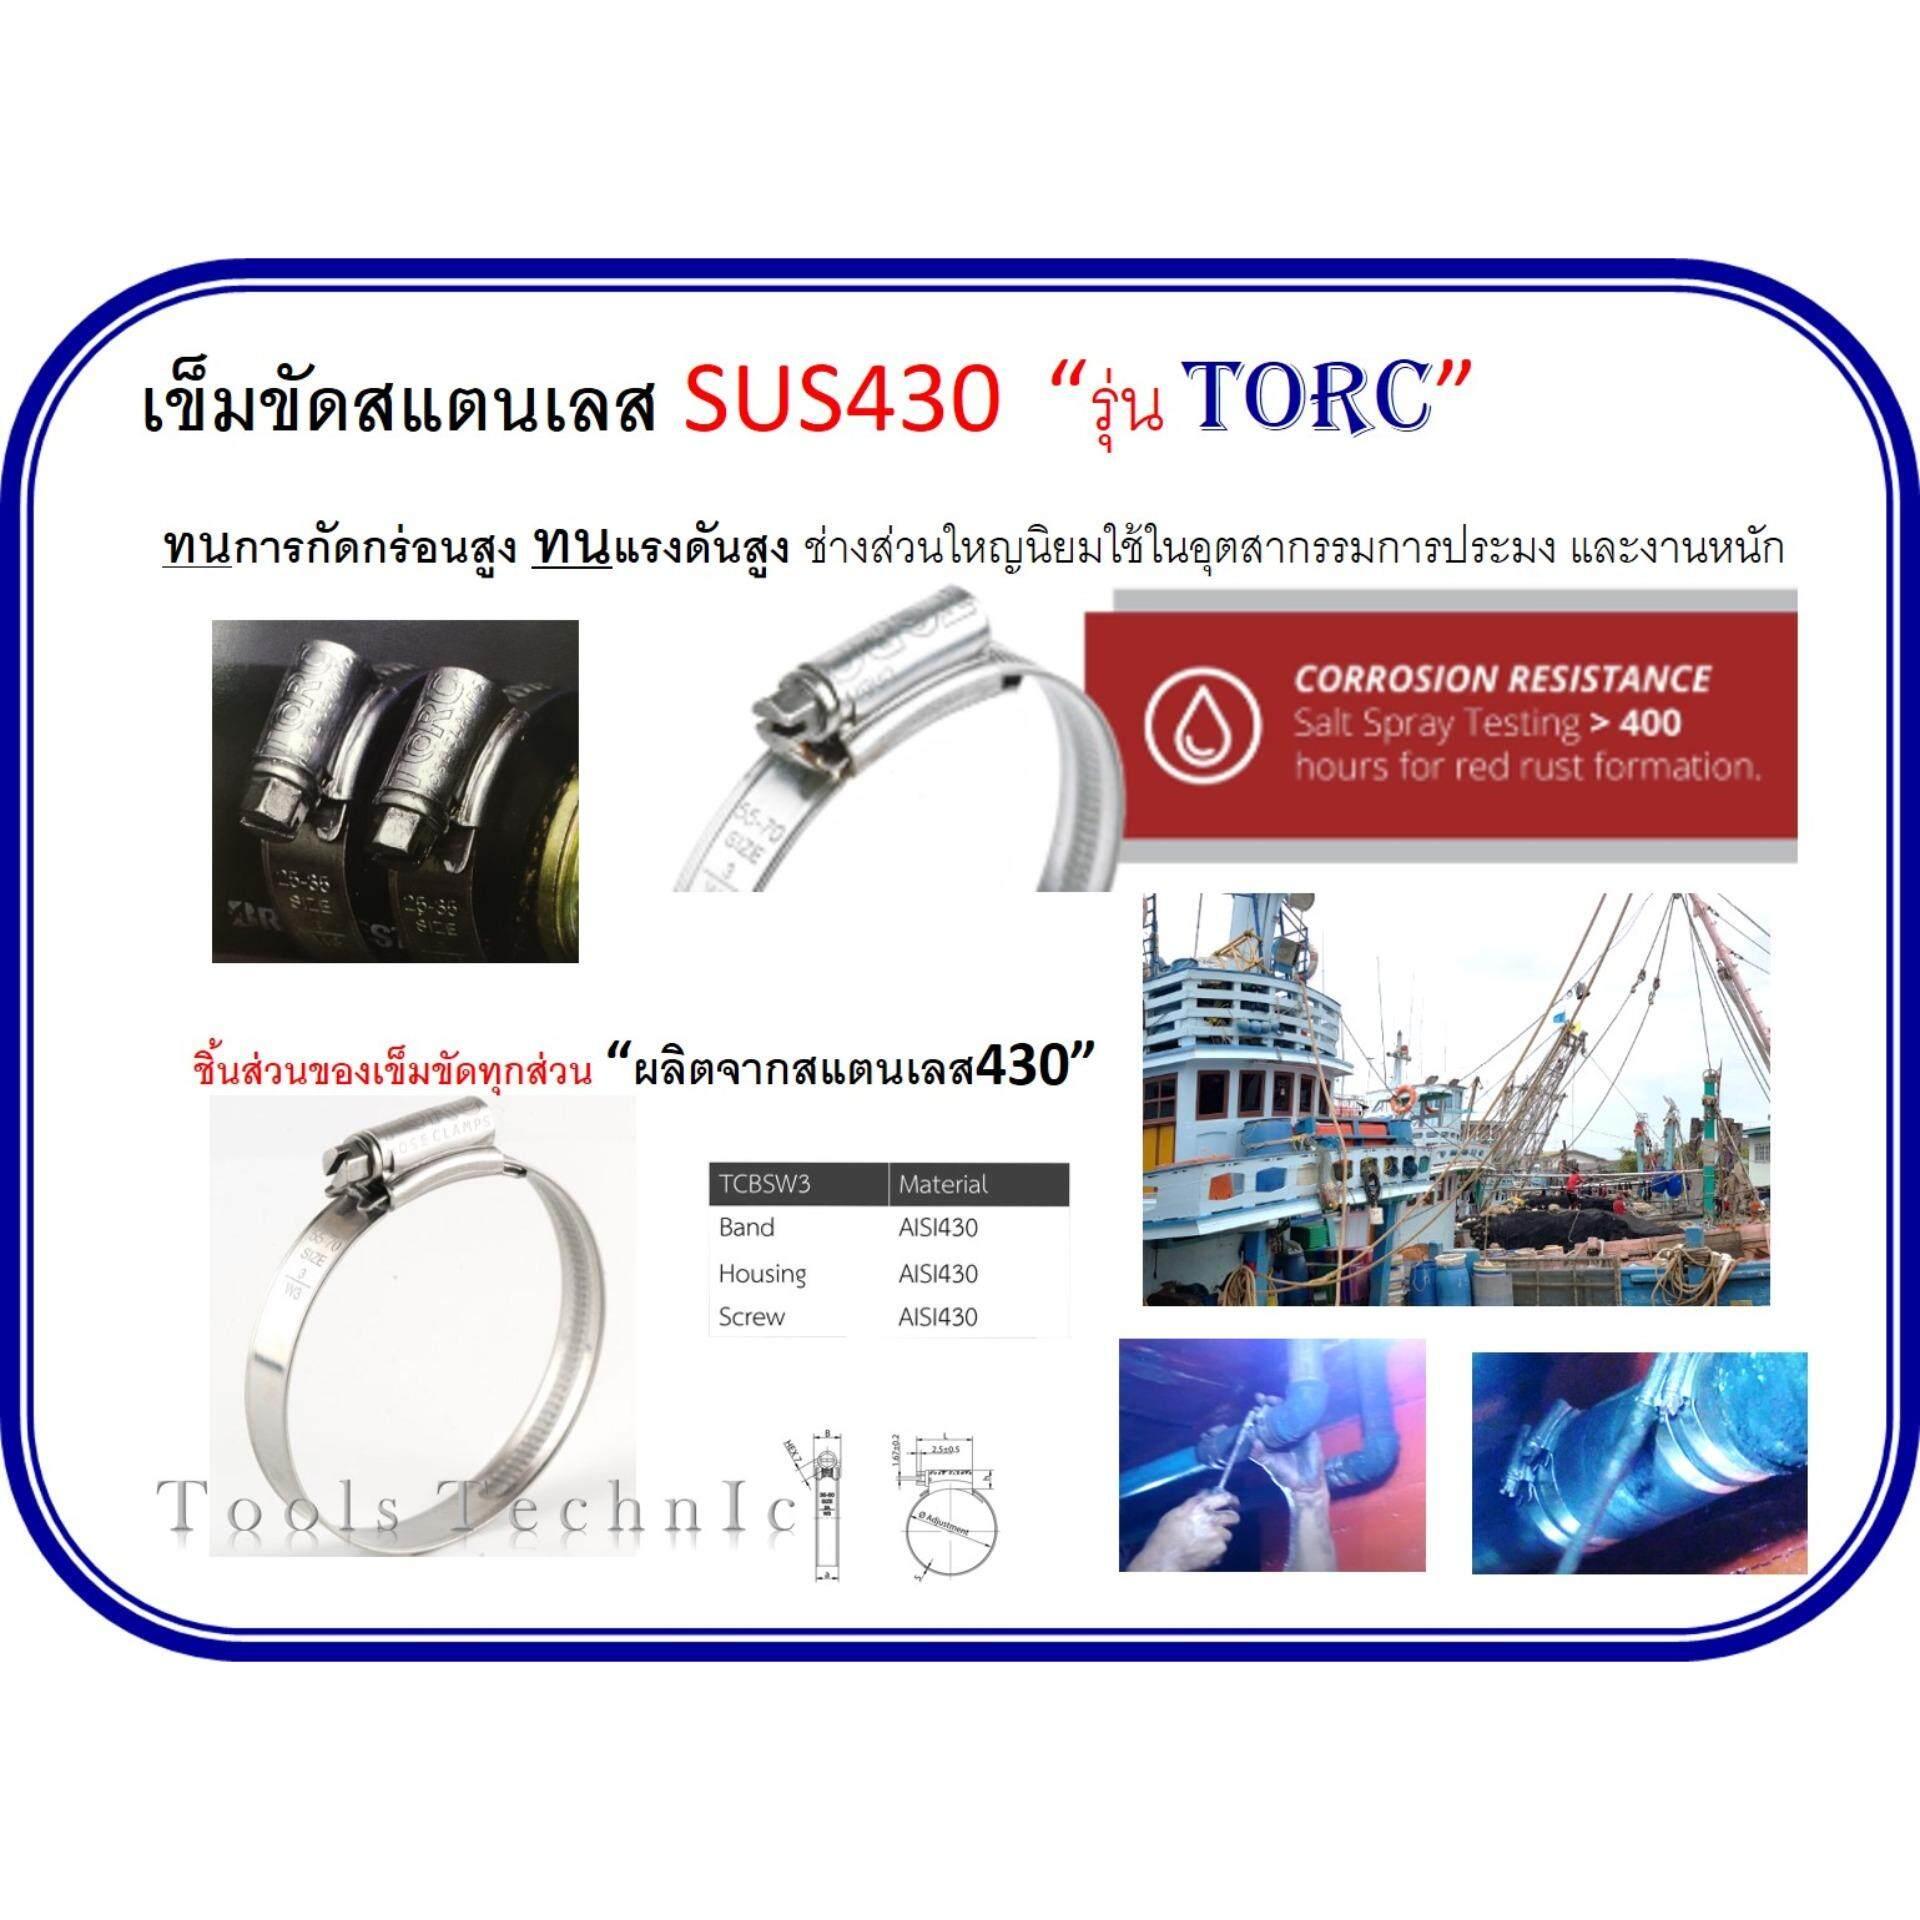 (x5)เข็มขัดรัดท่อ ออบิท รุ่นทอร์ค สแตนเลส W3 เกรด430 35-45mm. (1m) By Tools Technic.